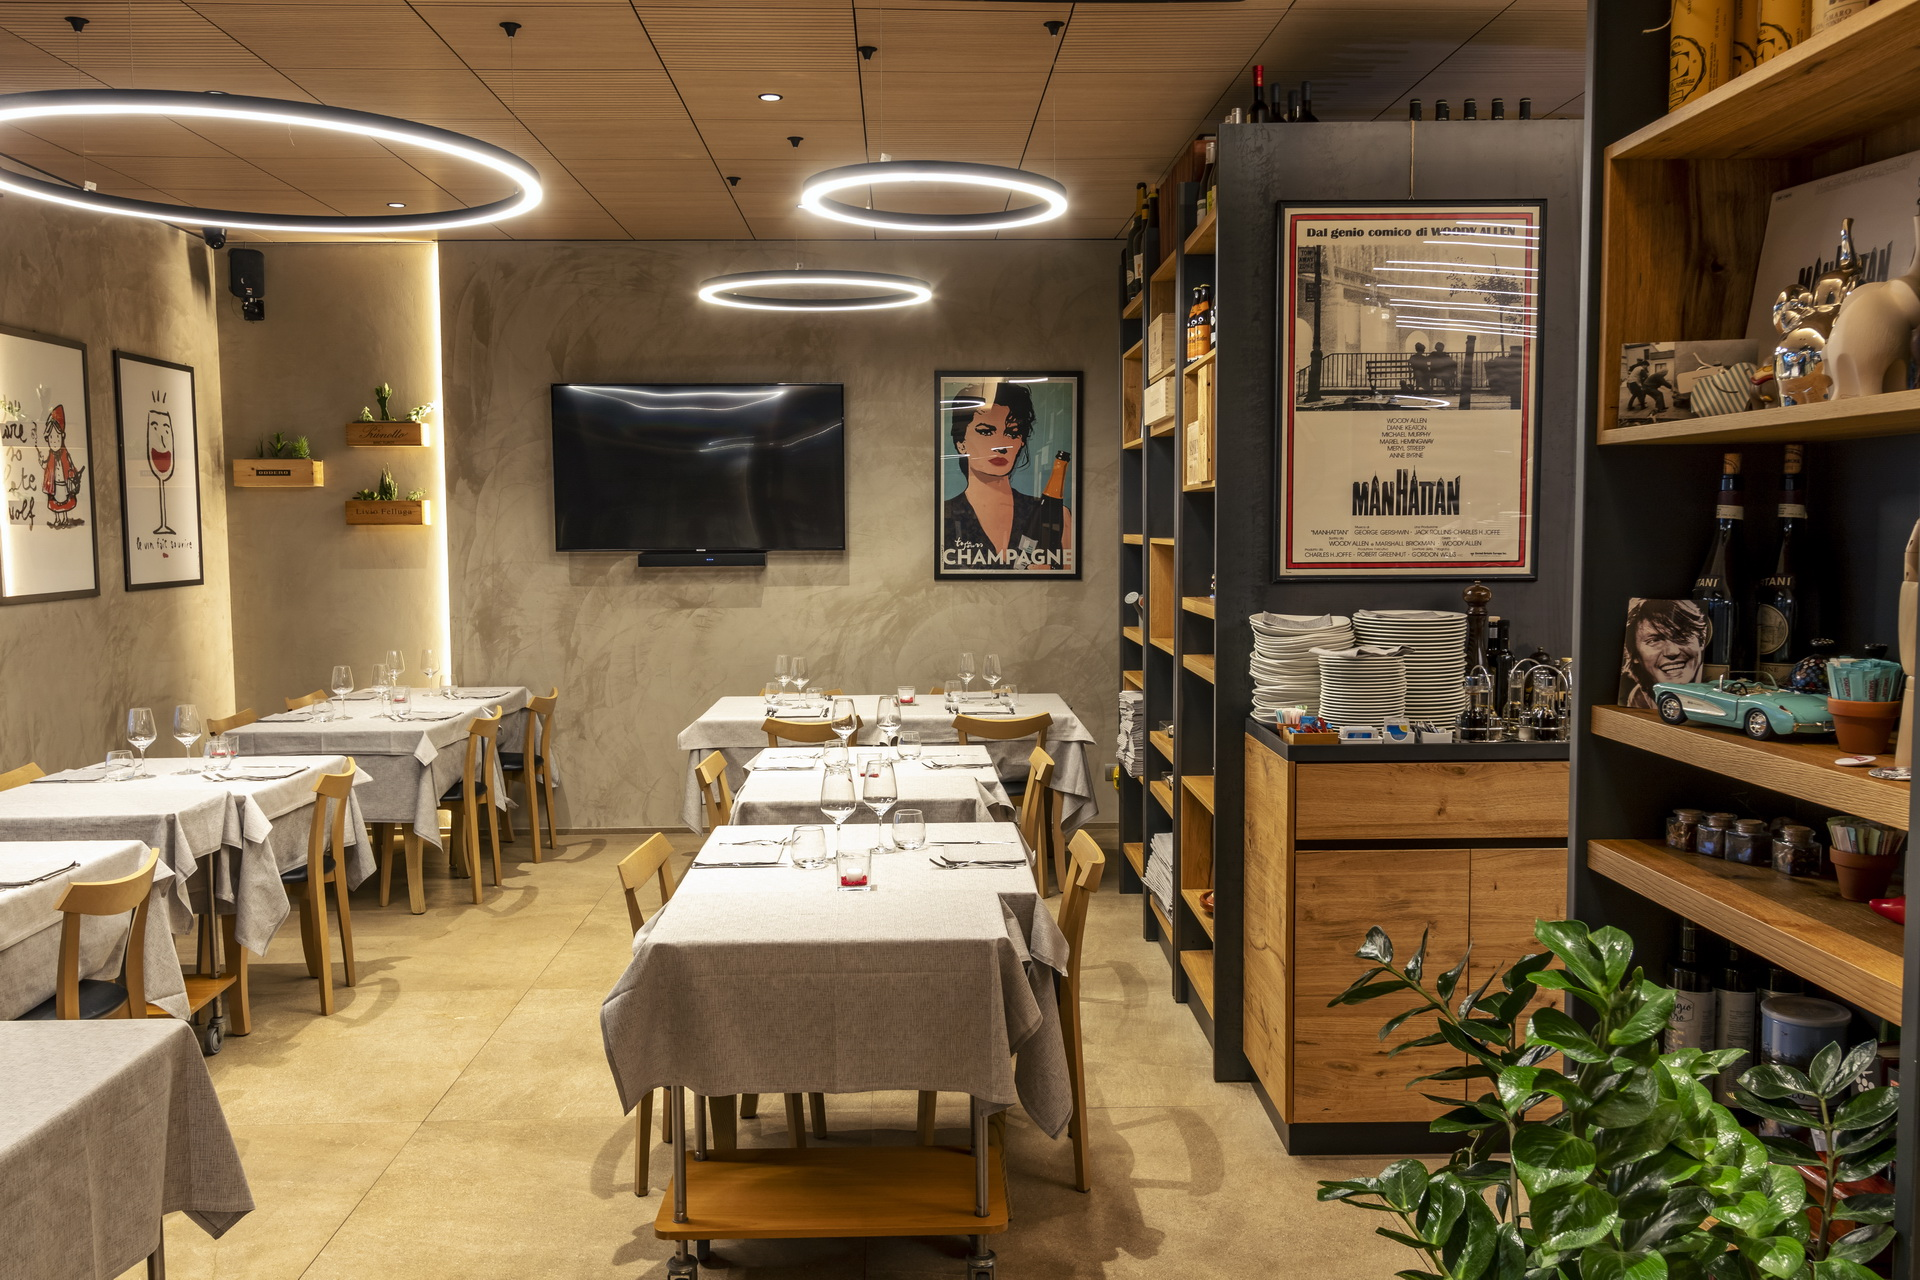 ristorante romantico moderno porto sant'elpidio